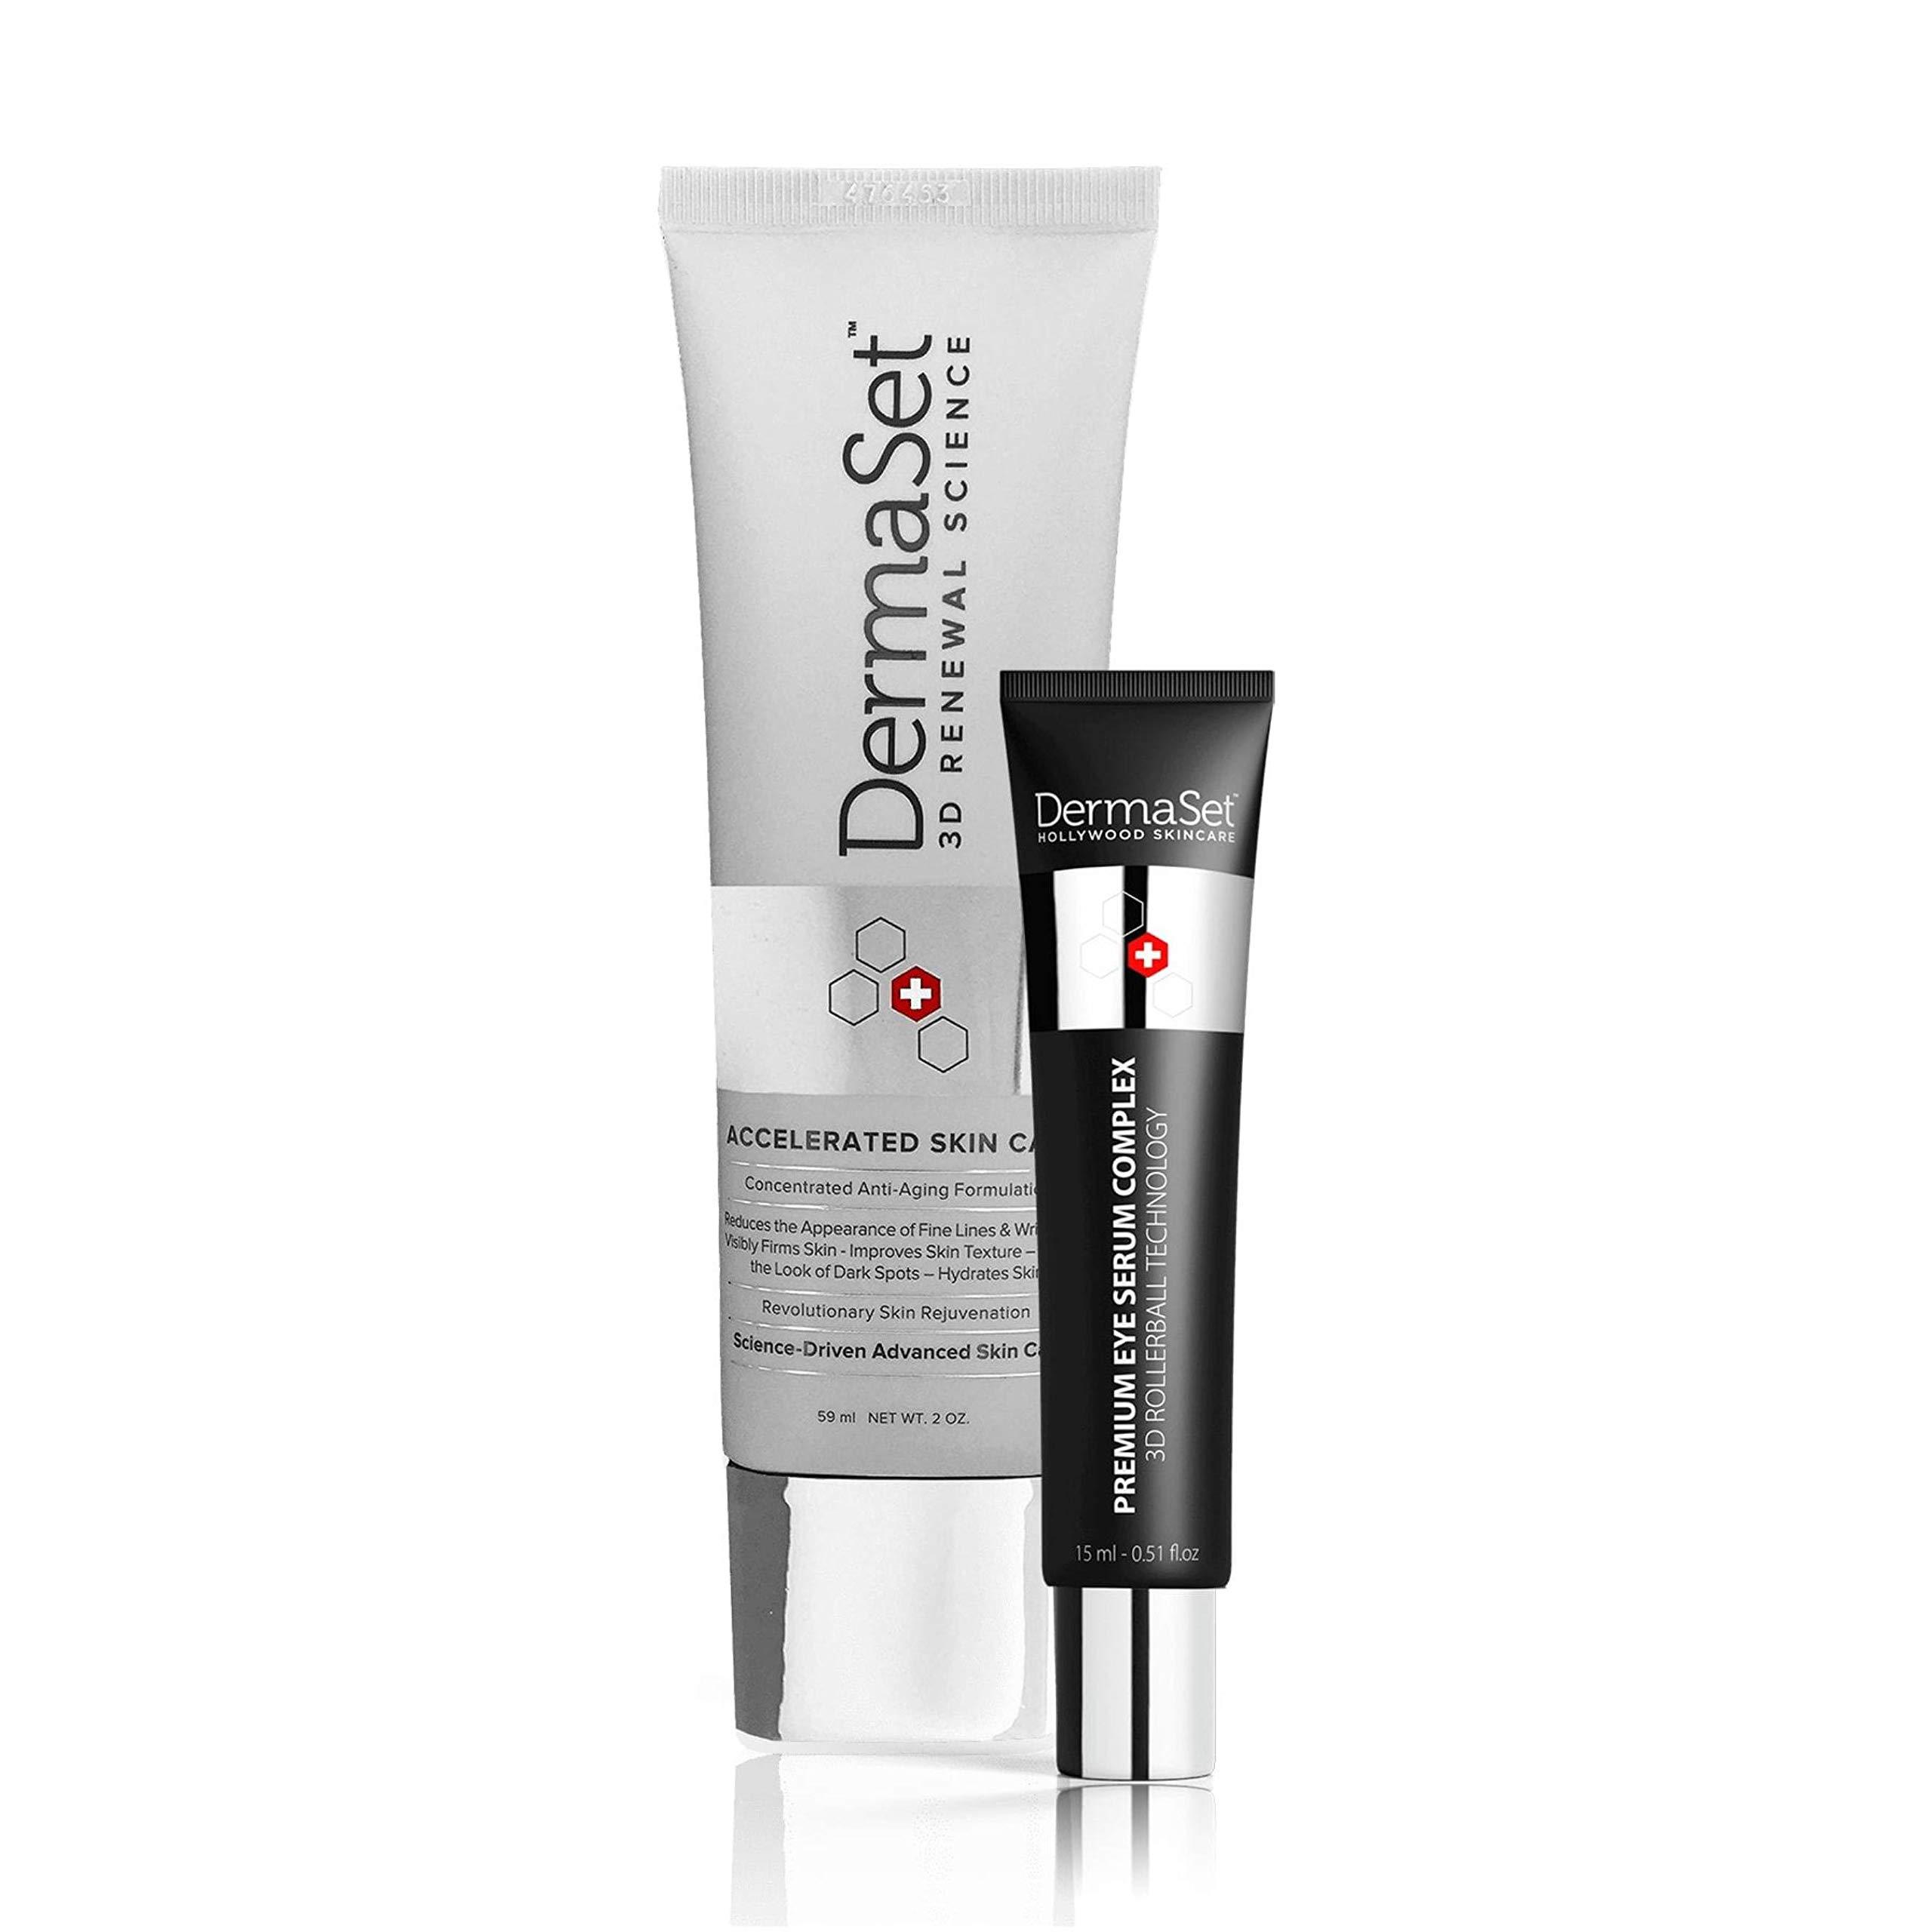 DermaSet Anti-Aging Cream and Premium Eye Serum Rollerball Bundle of Youth by DermaSet